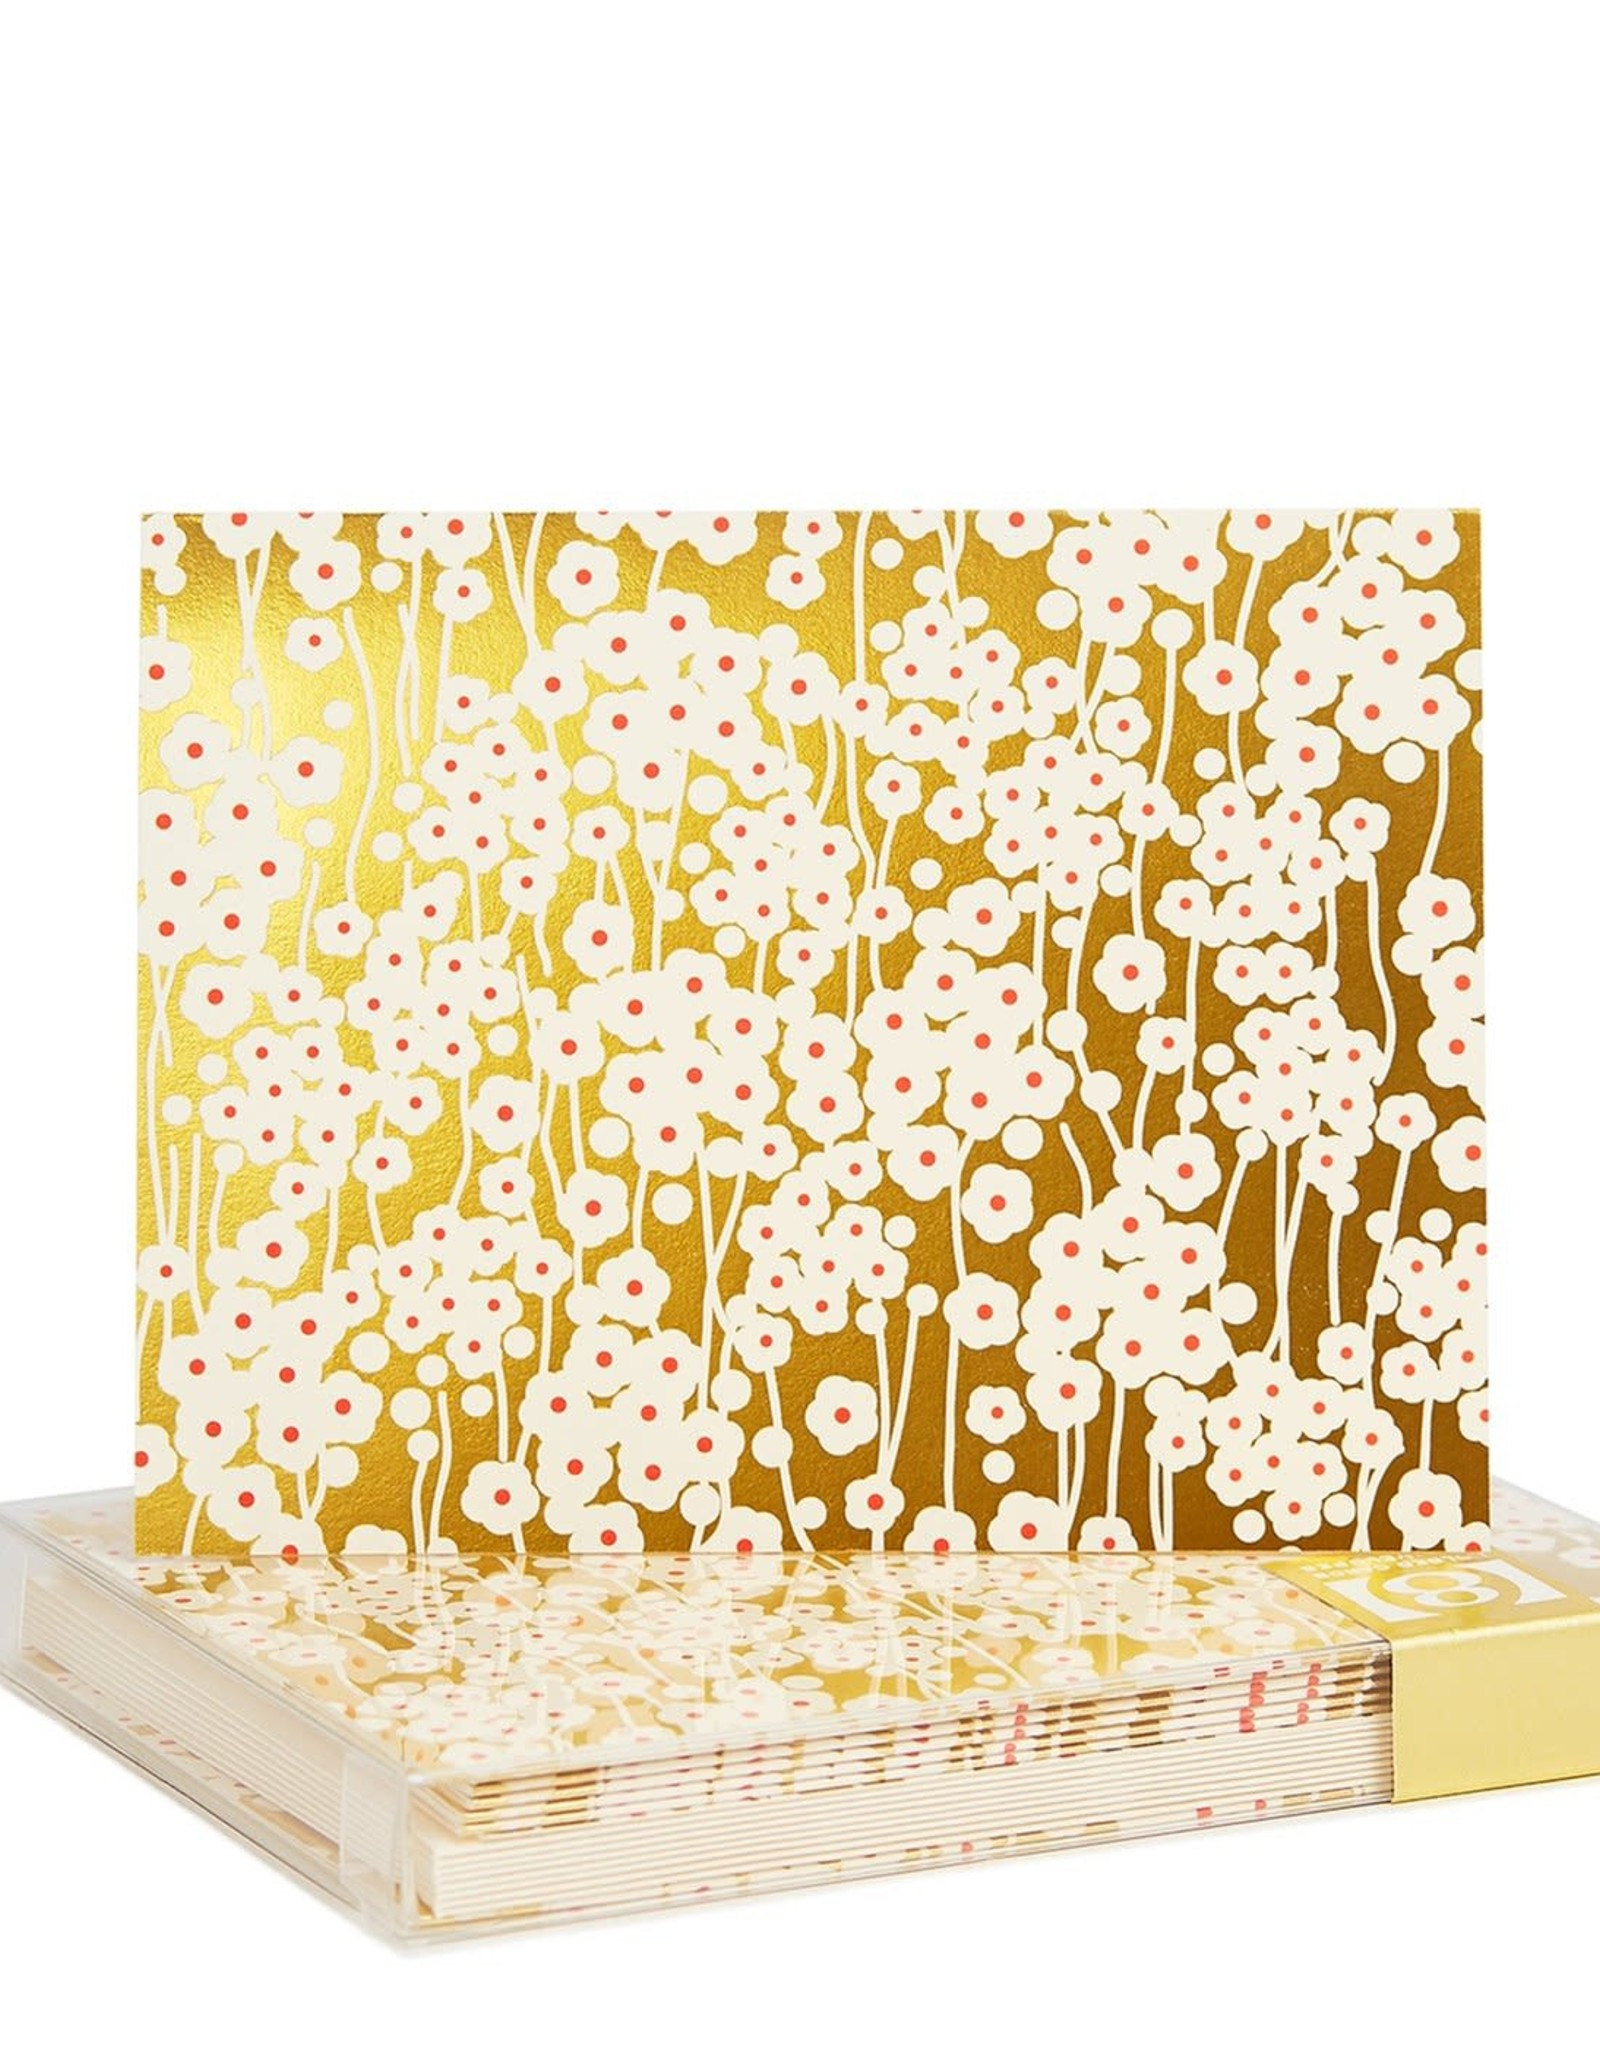 Celine Boxed Cards Set of 8